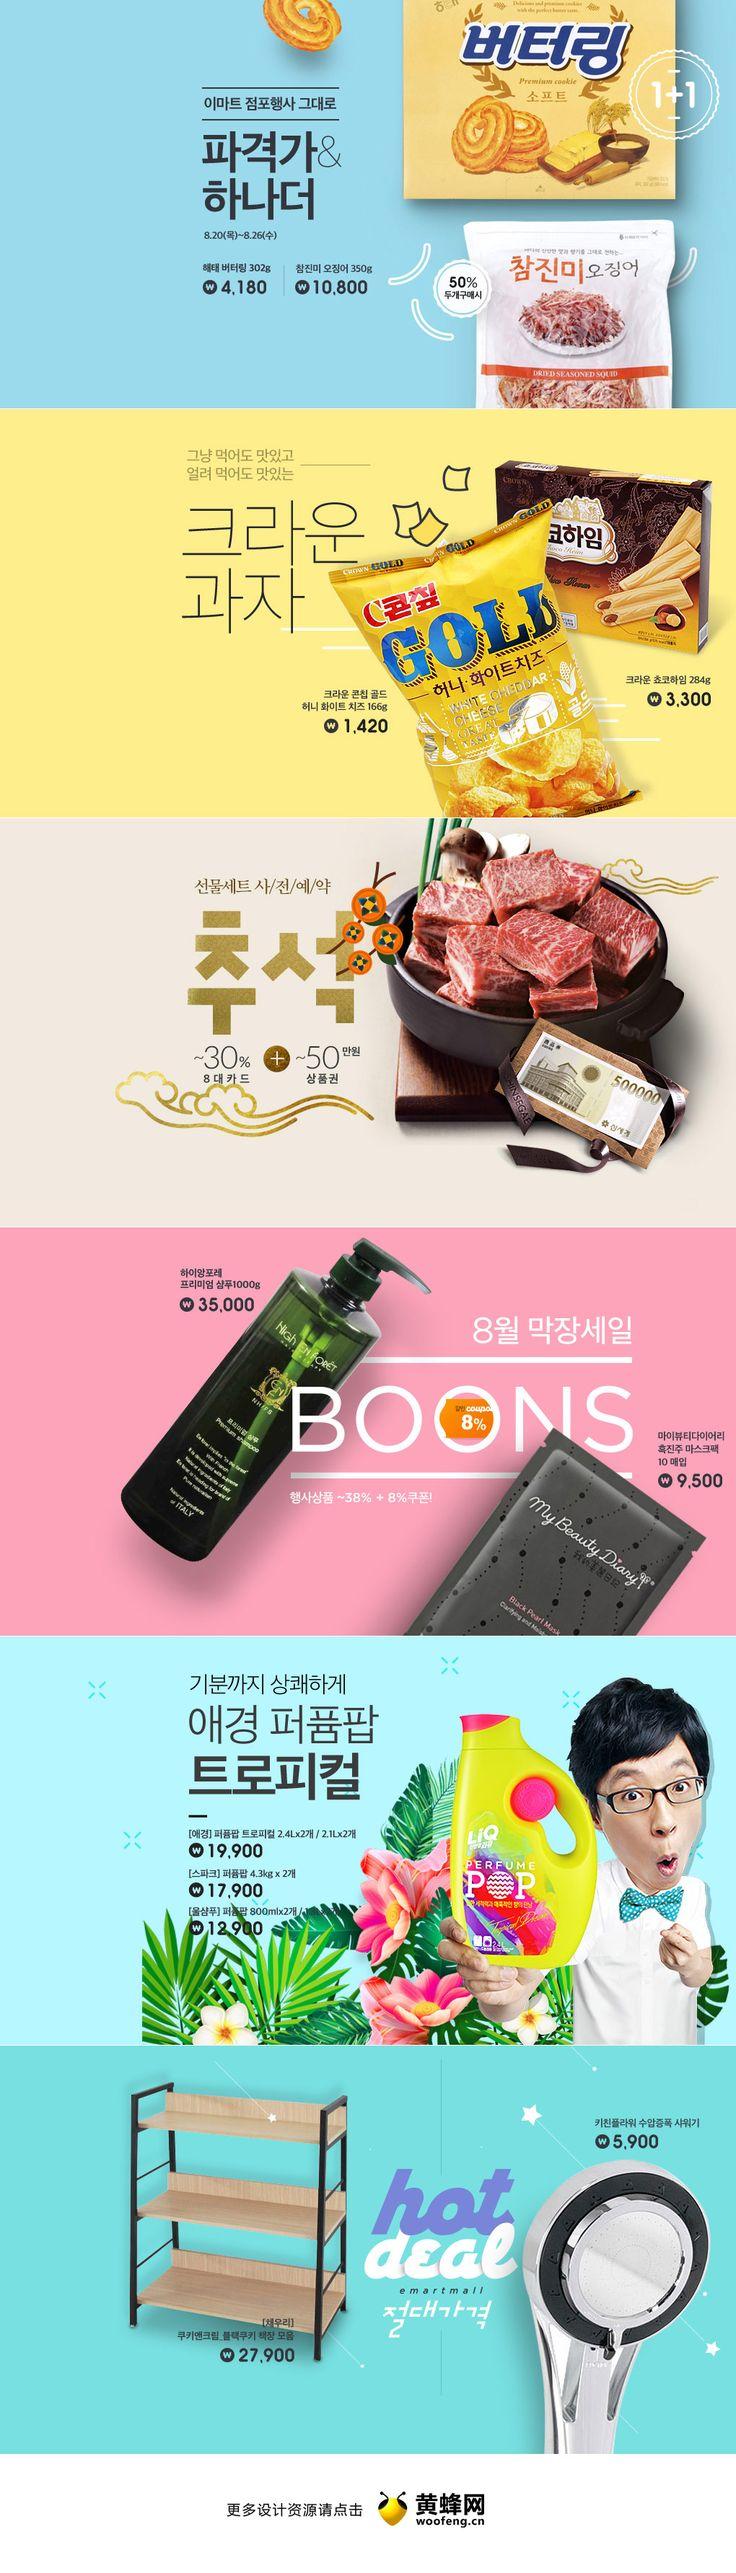 SSG超市网站banner设计,来源自黄蜂网http://woofeng.cn/